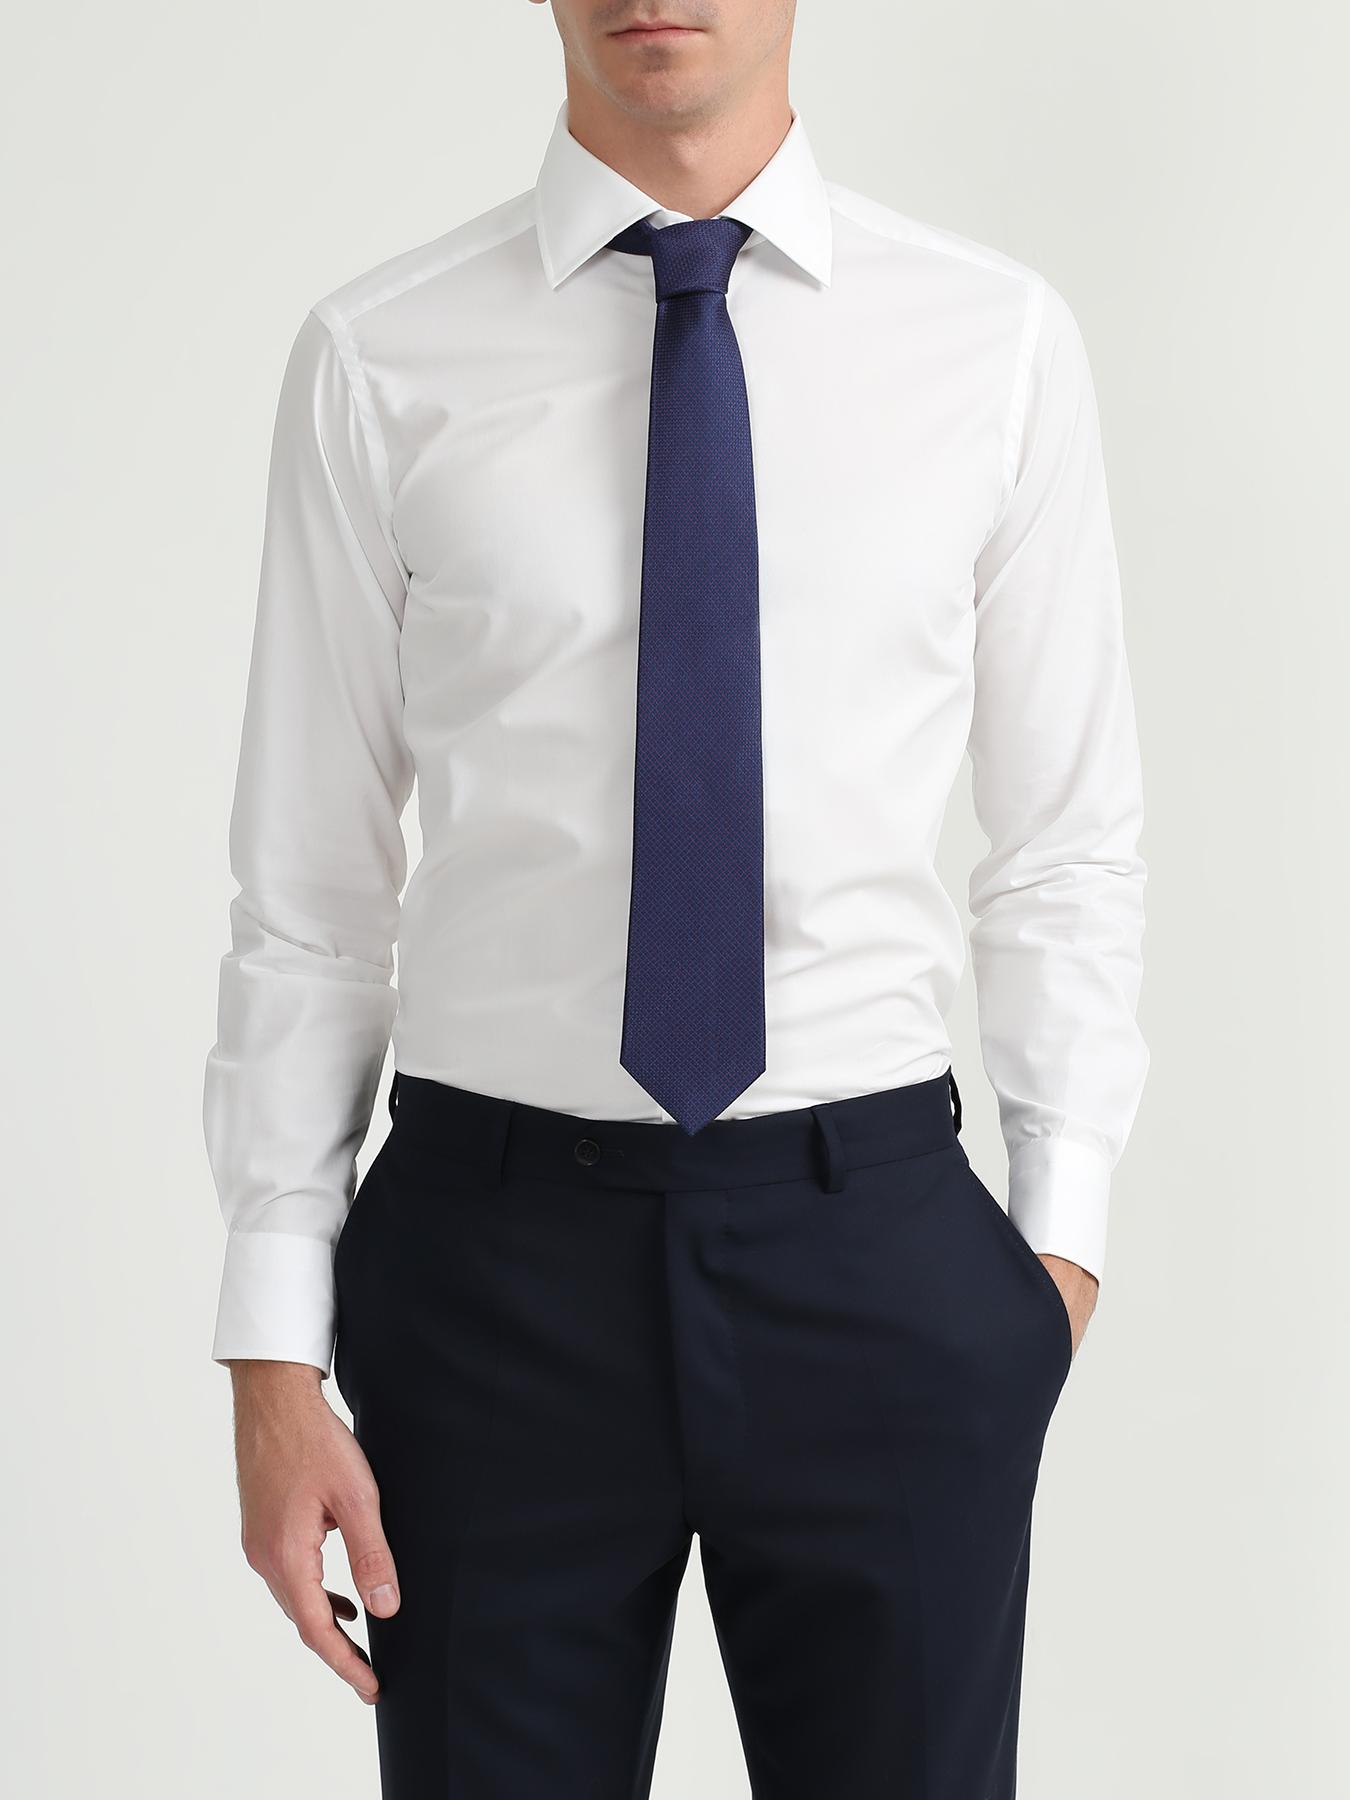 Alessandro Manzoni Шелковый галстук с узорами 324186-185